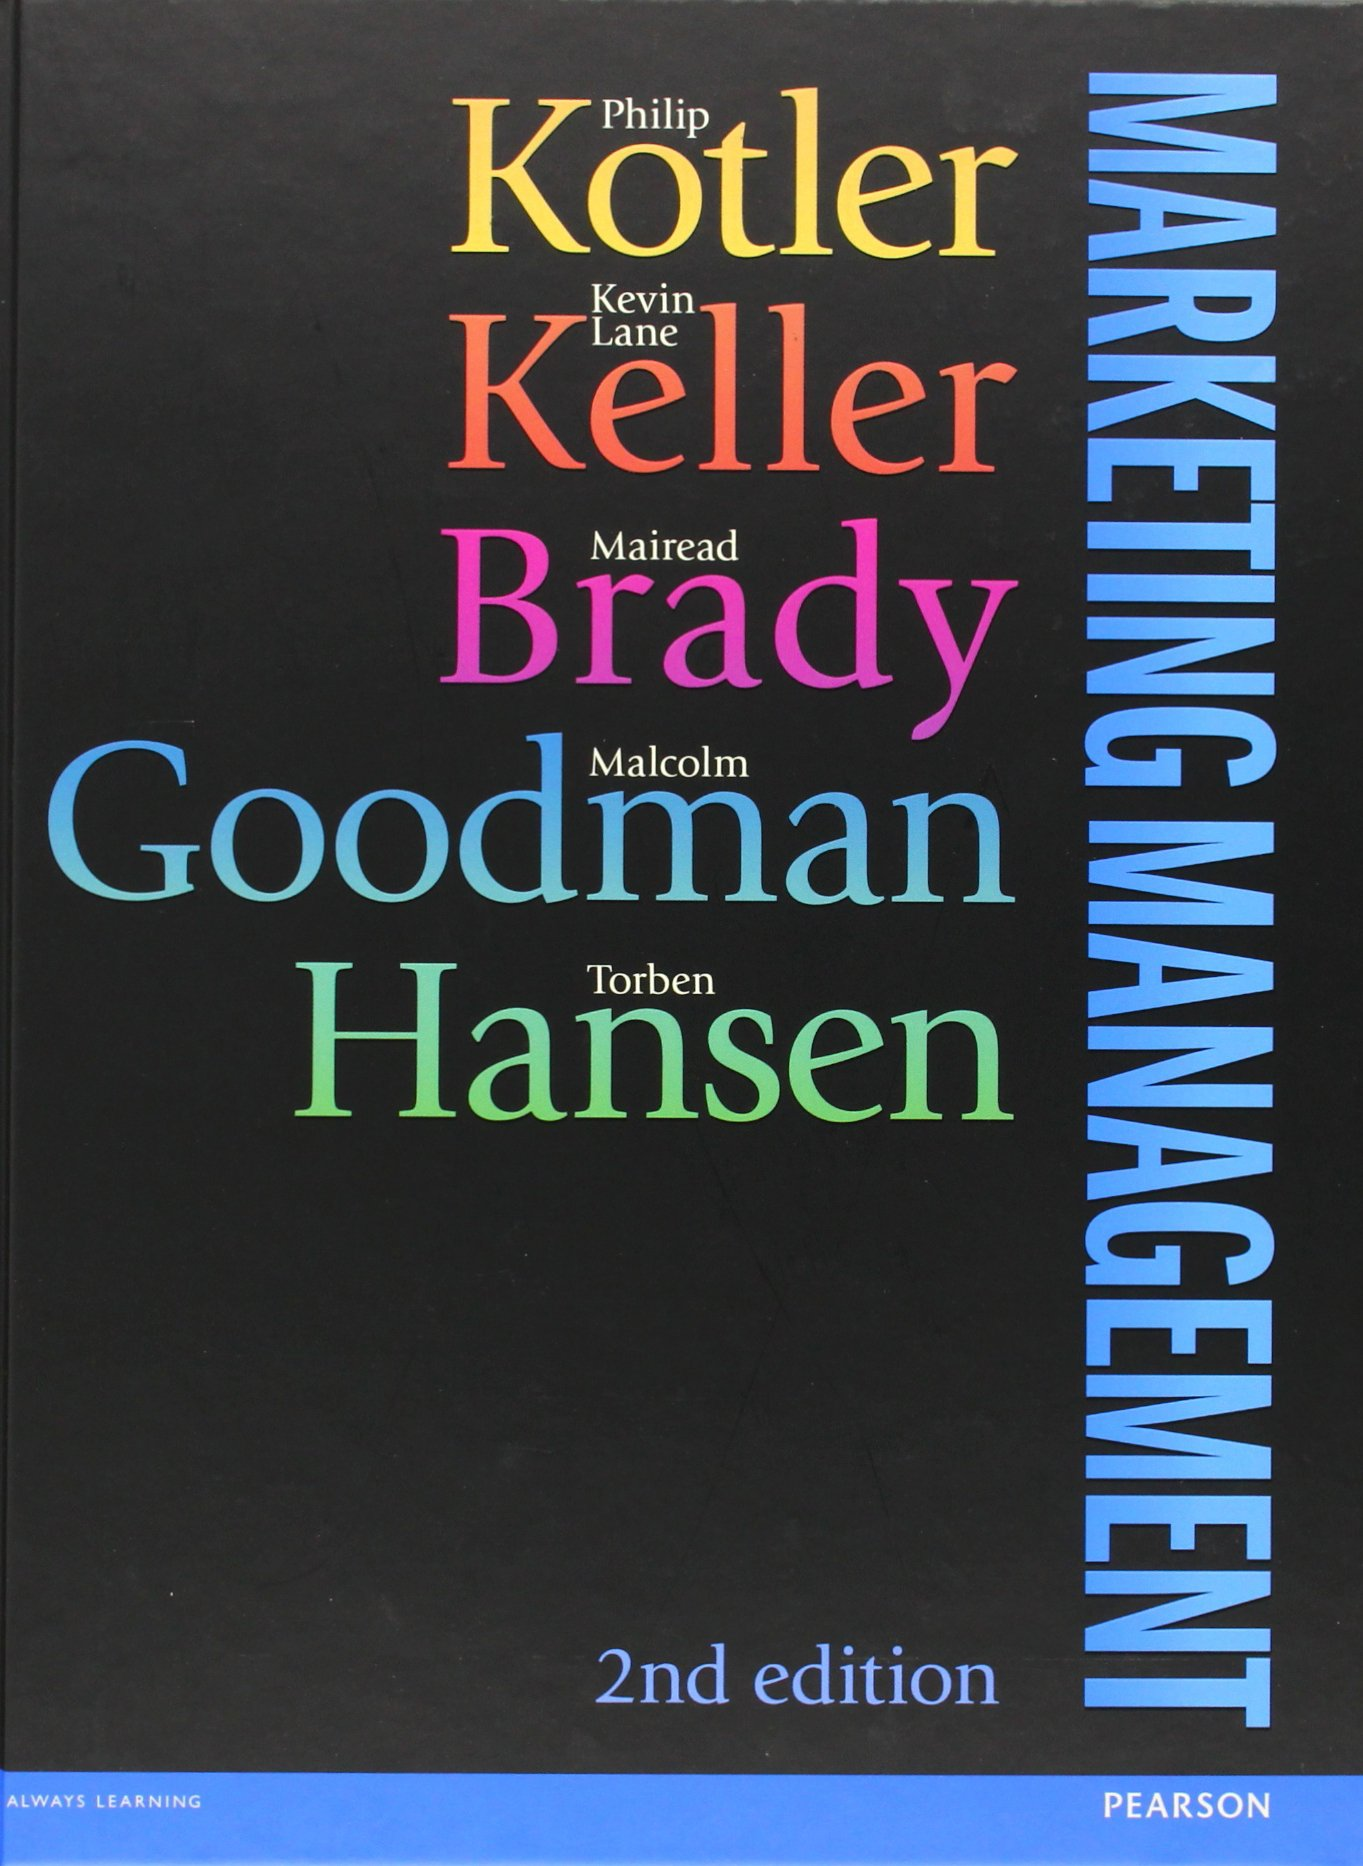 Kotler On Marketing Book